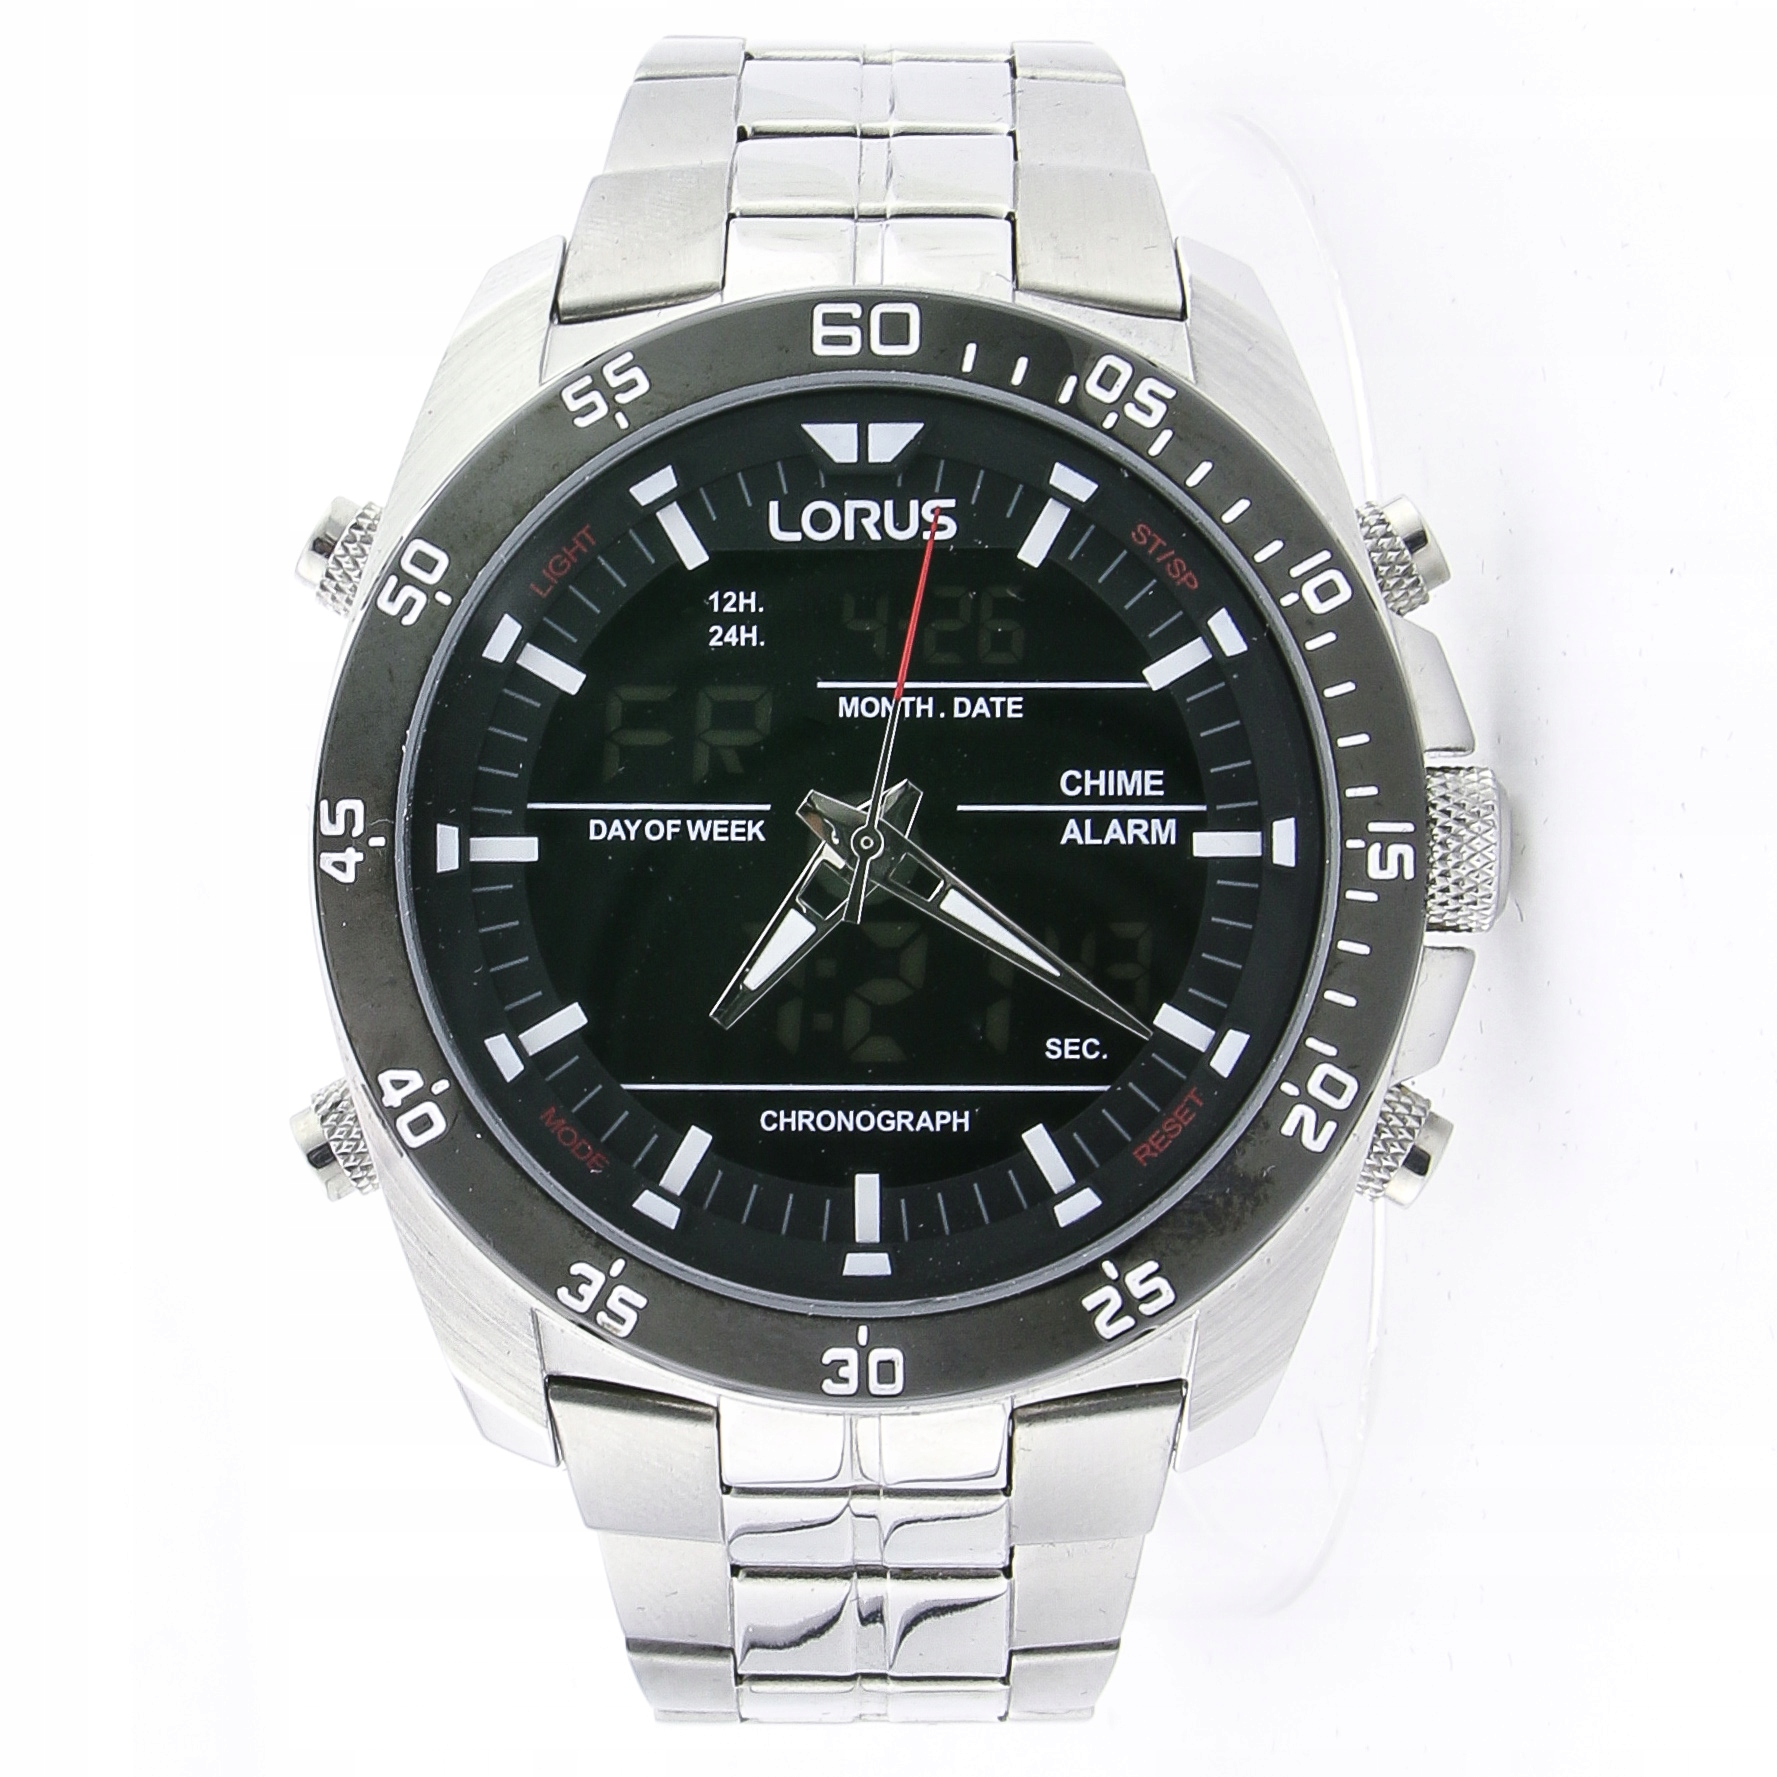 Zegarek LORUS RW611AX9 chronograf 10 ATM